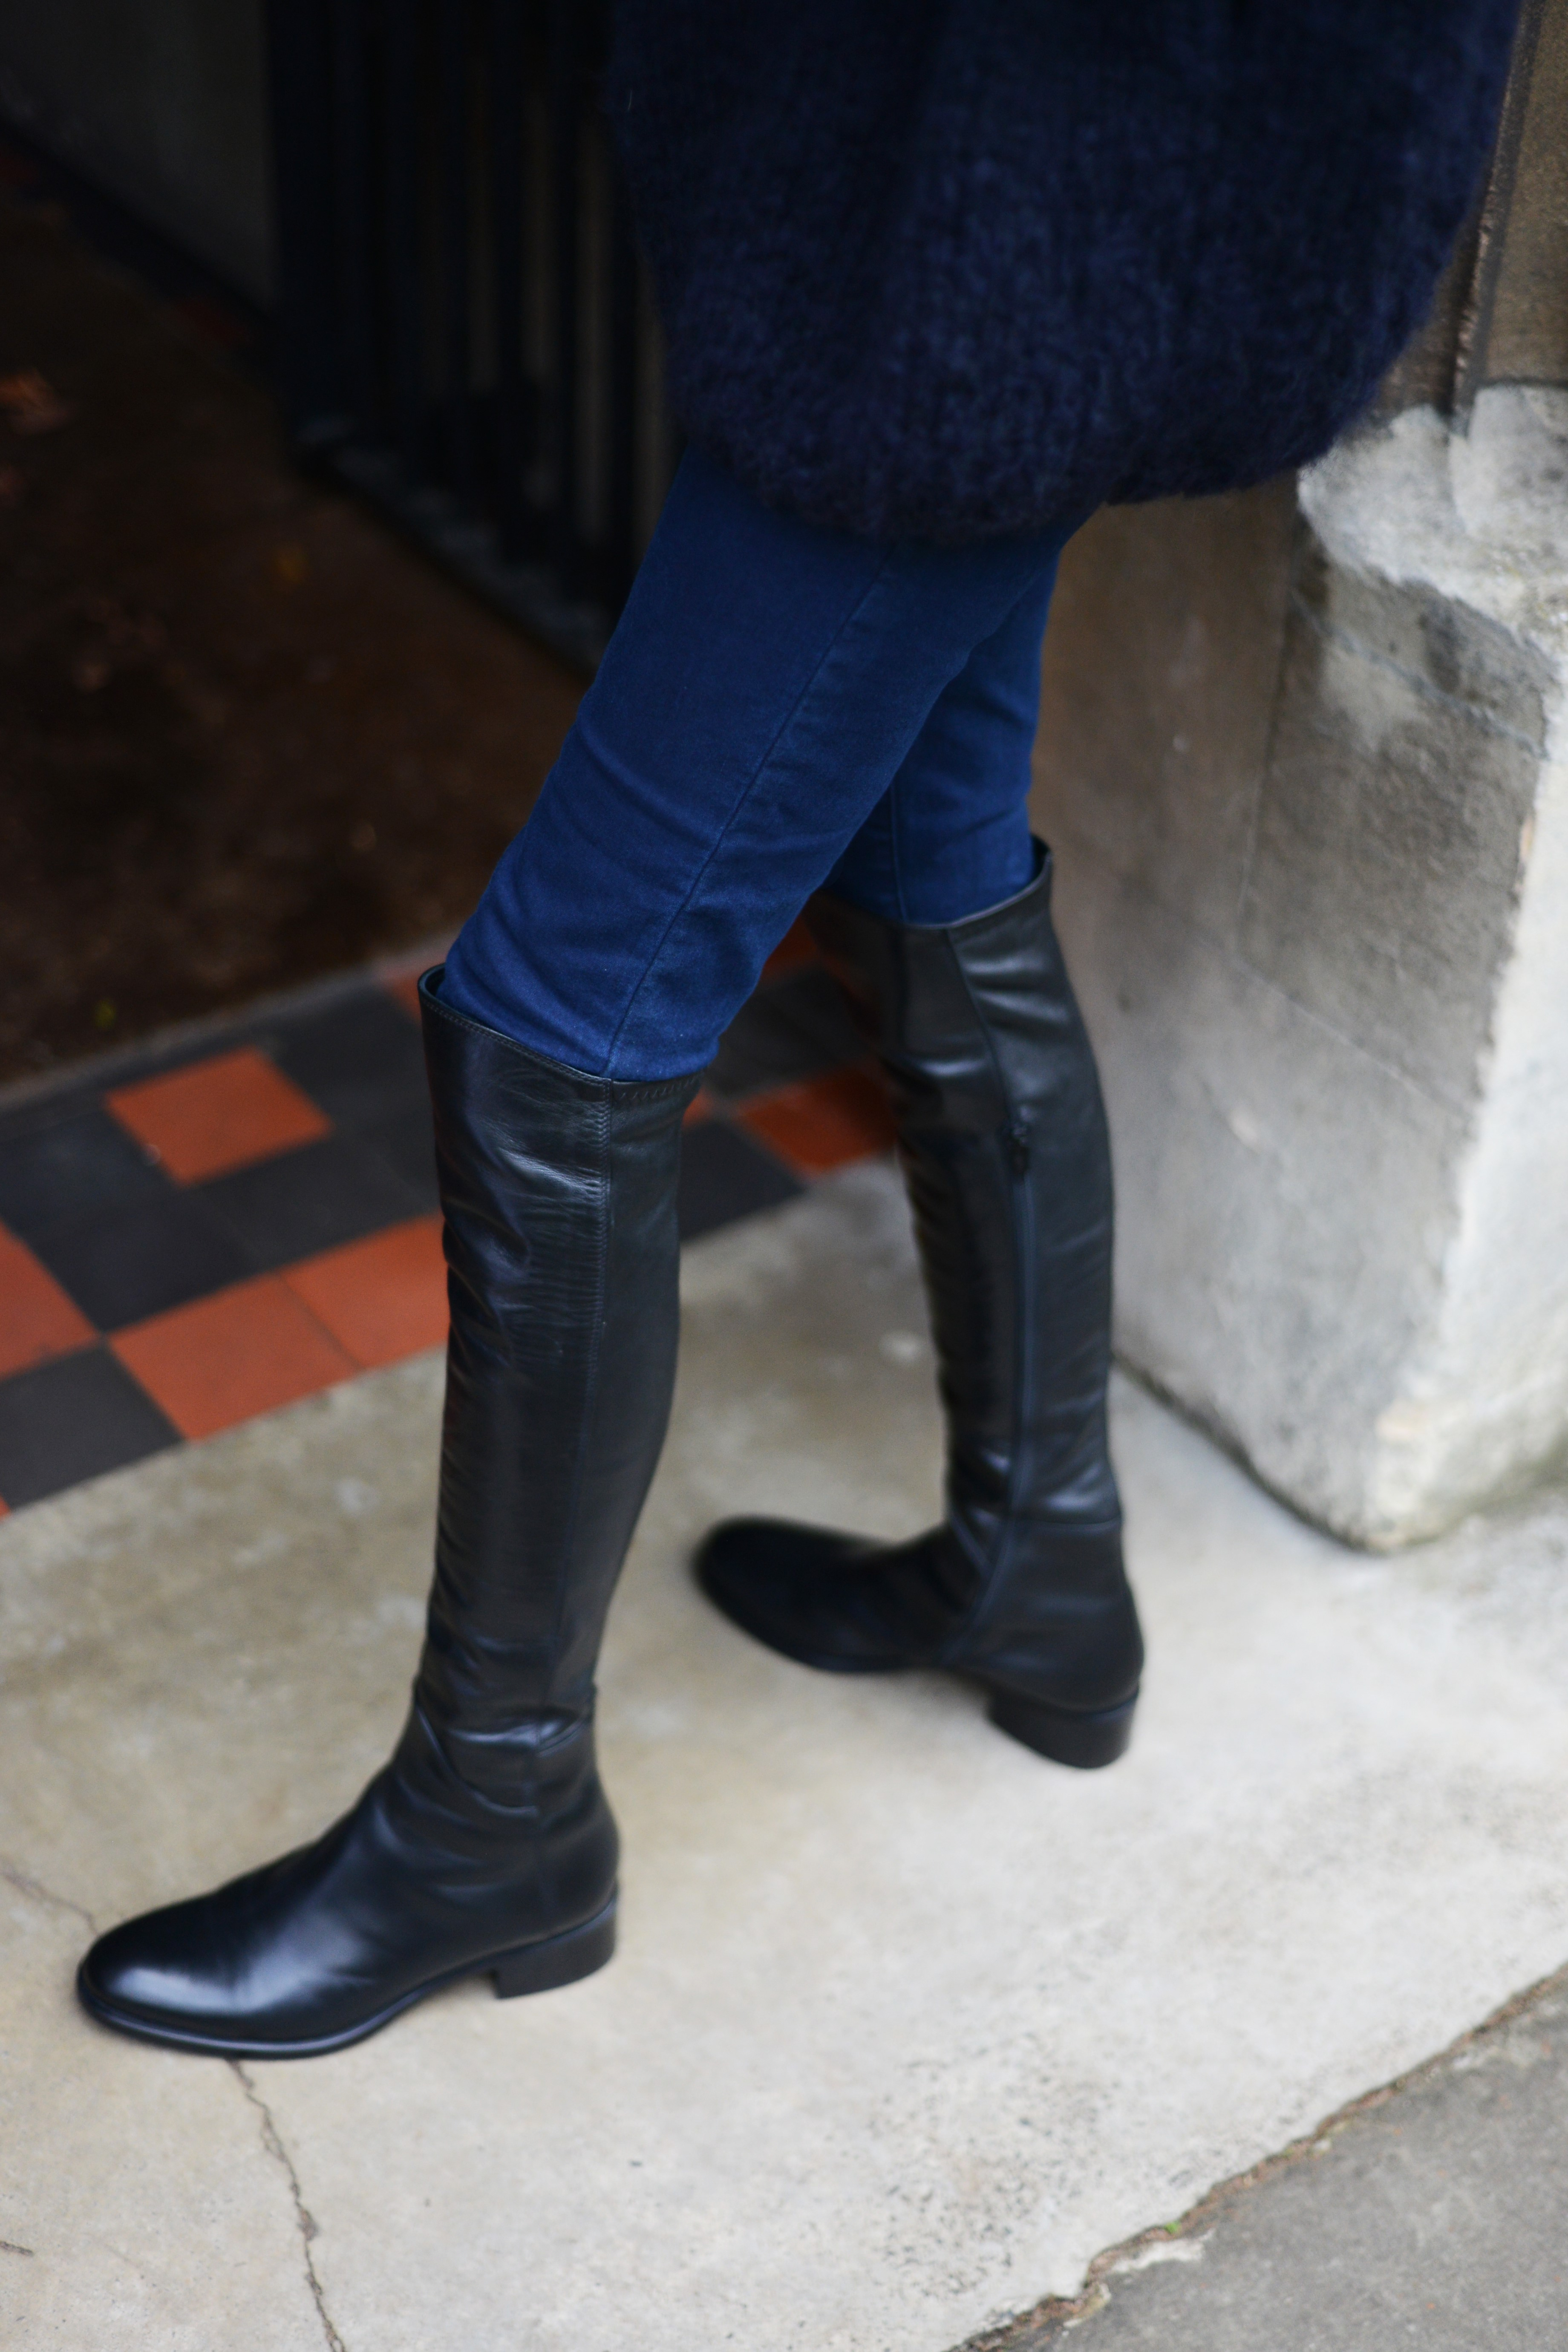 KS SHOPS: Slim Fitting Boots – Keith